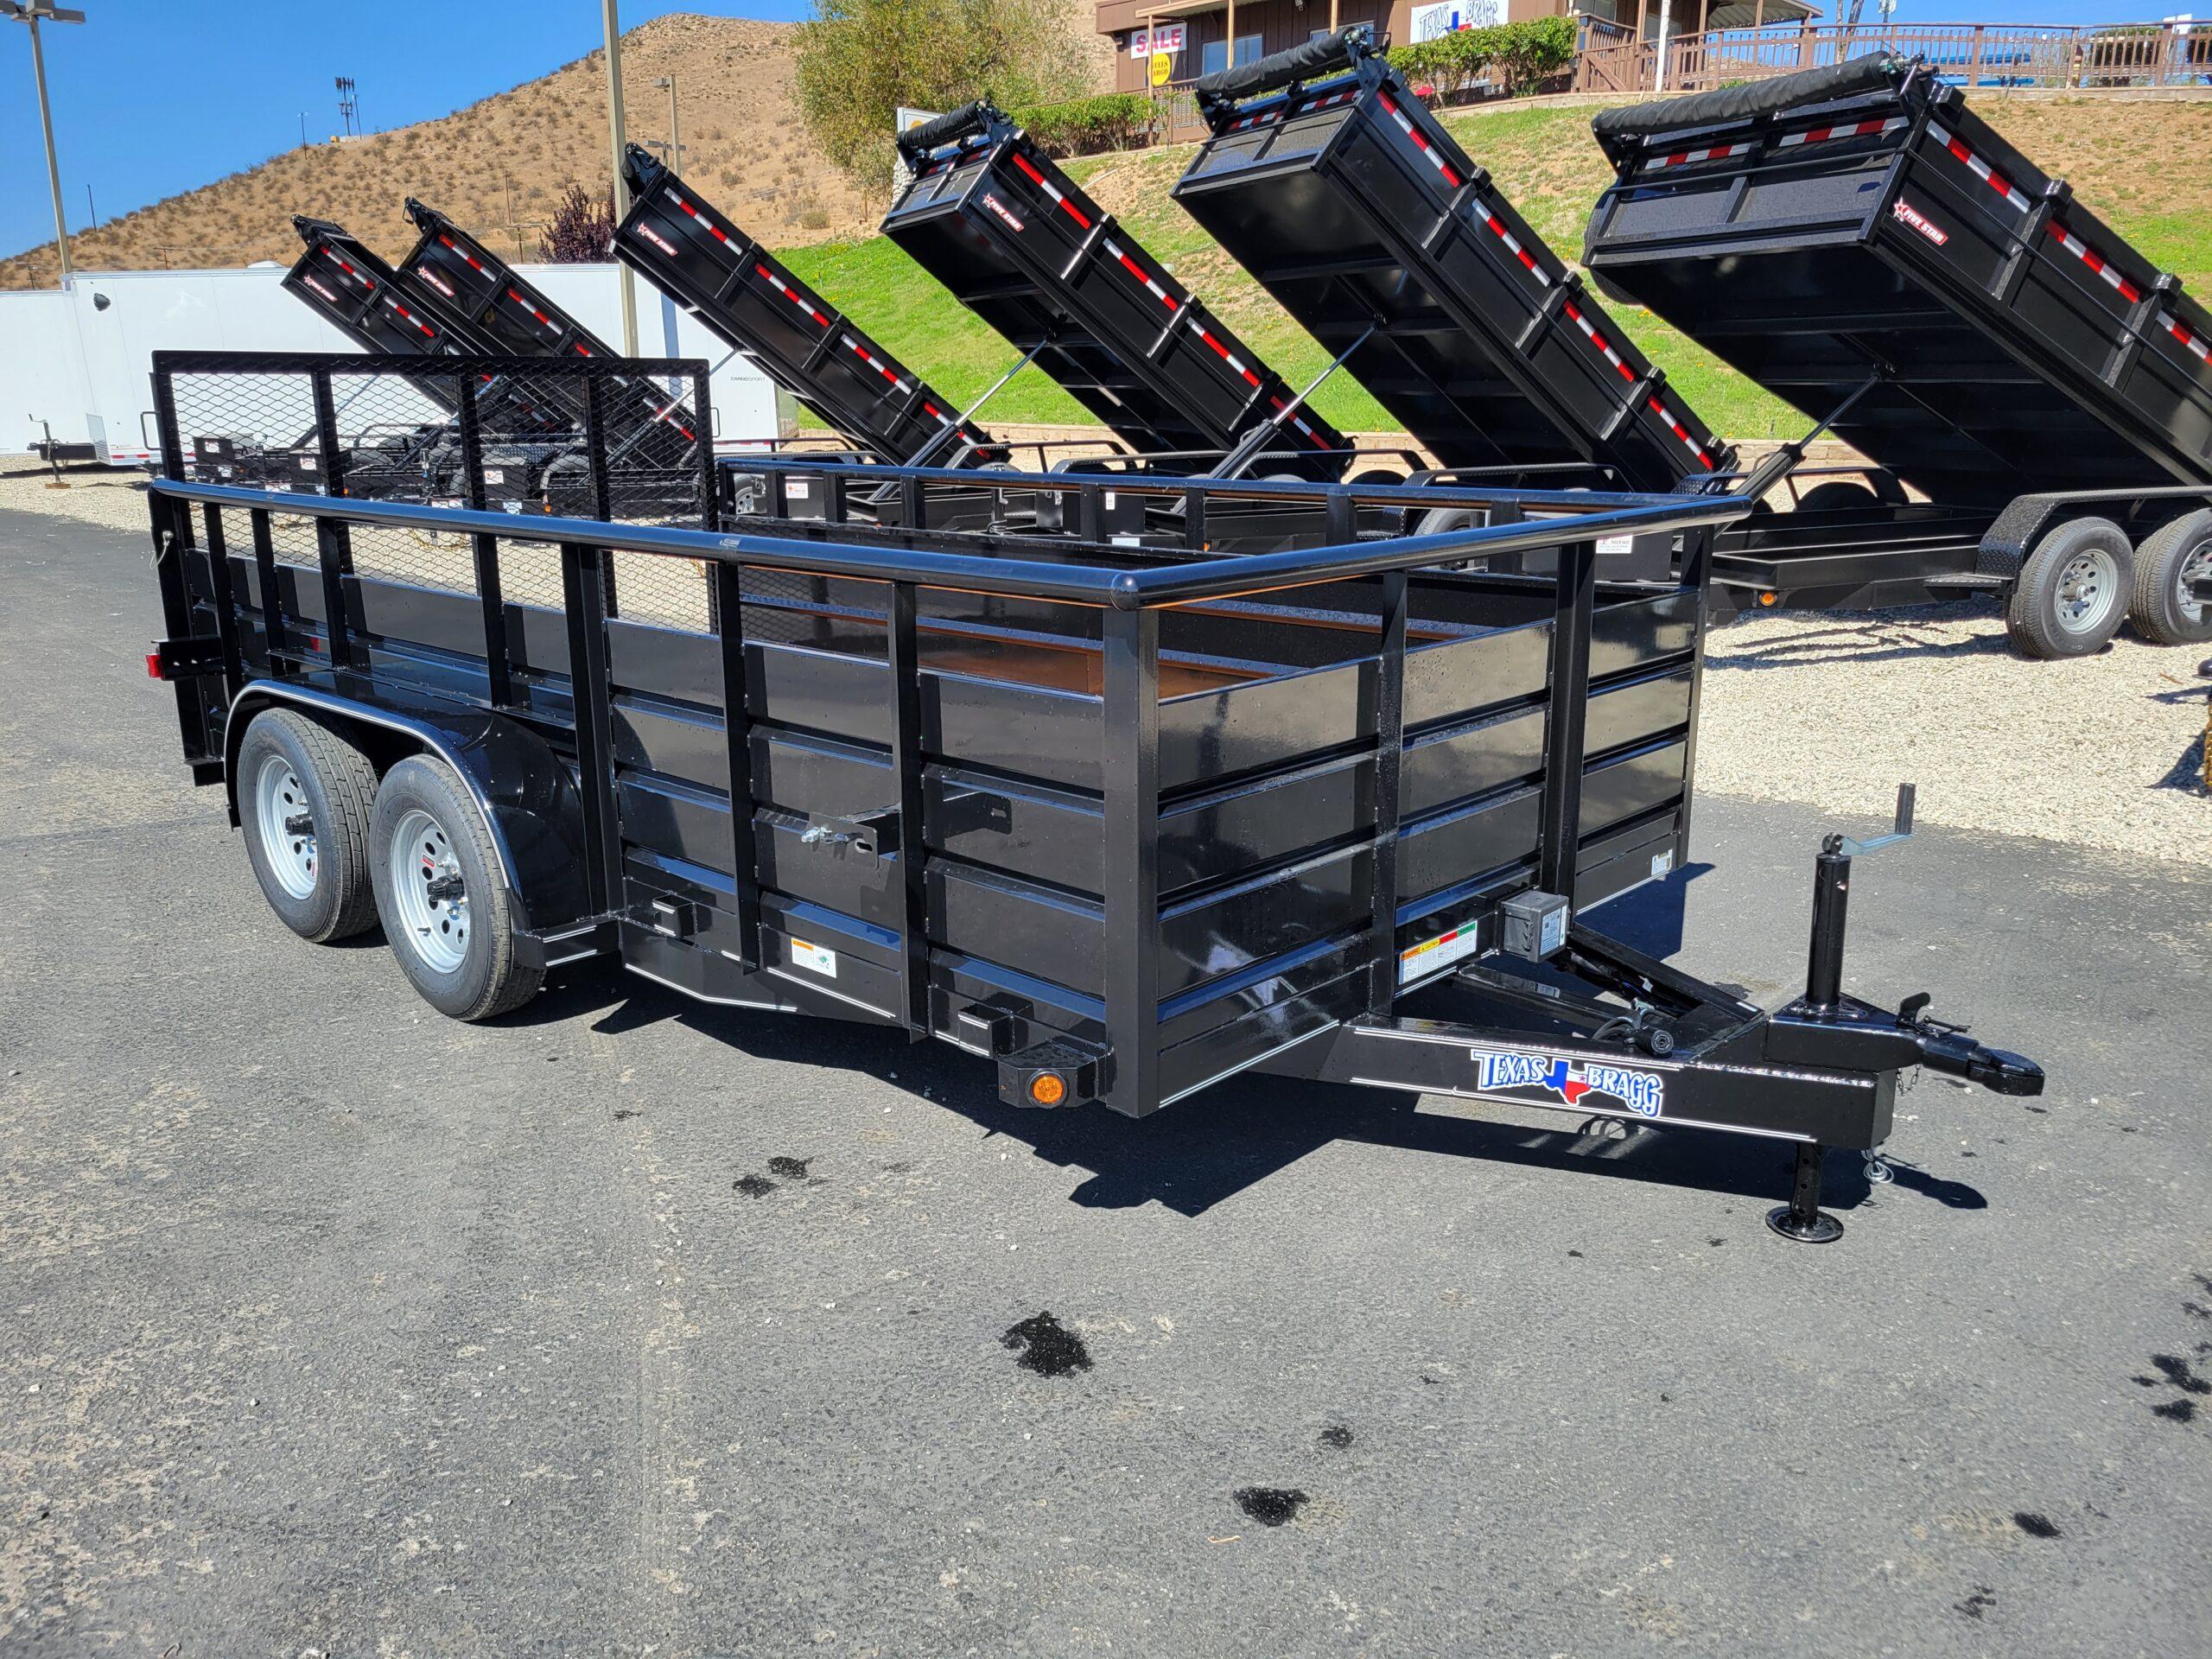 Texas Bragg 7x14 Panelwagon - Passenger side front 3/4 view